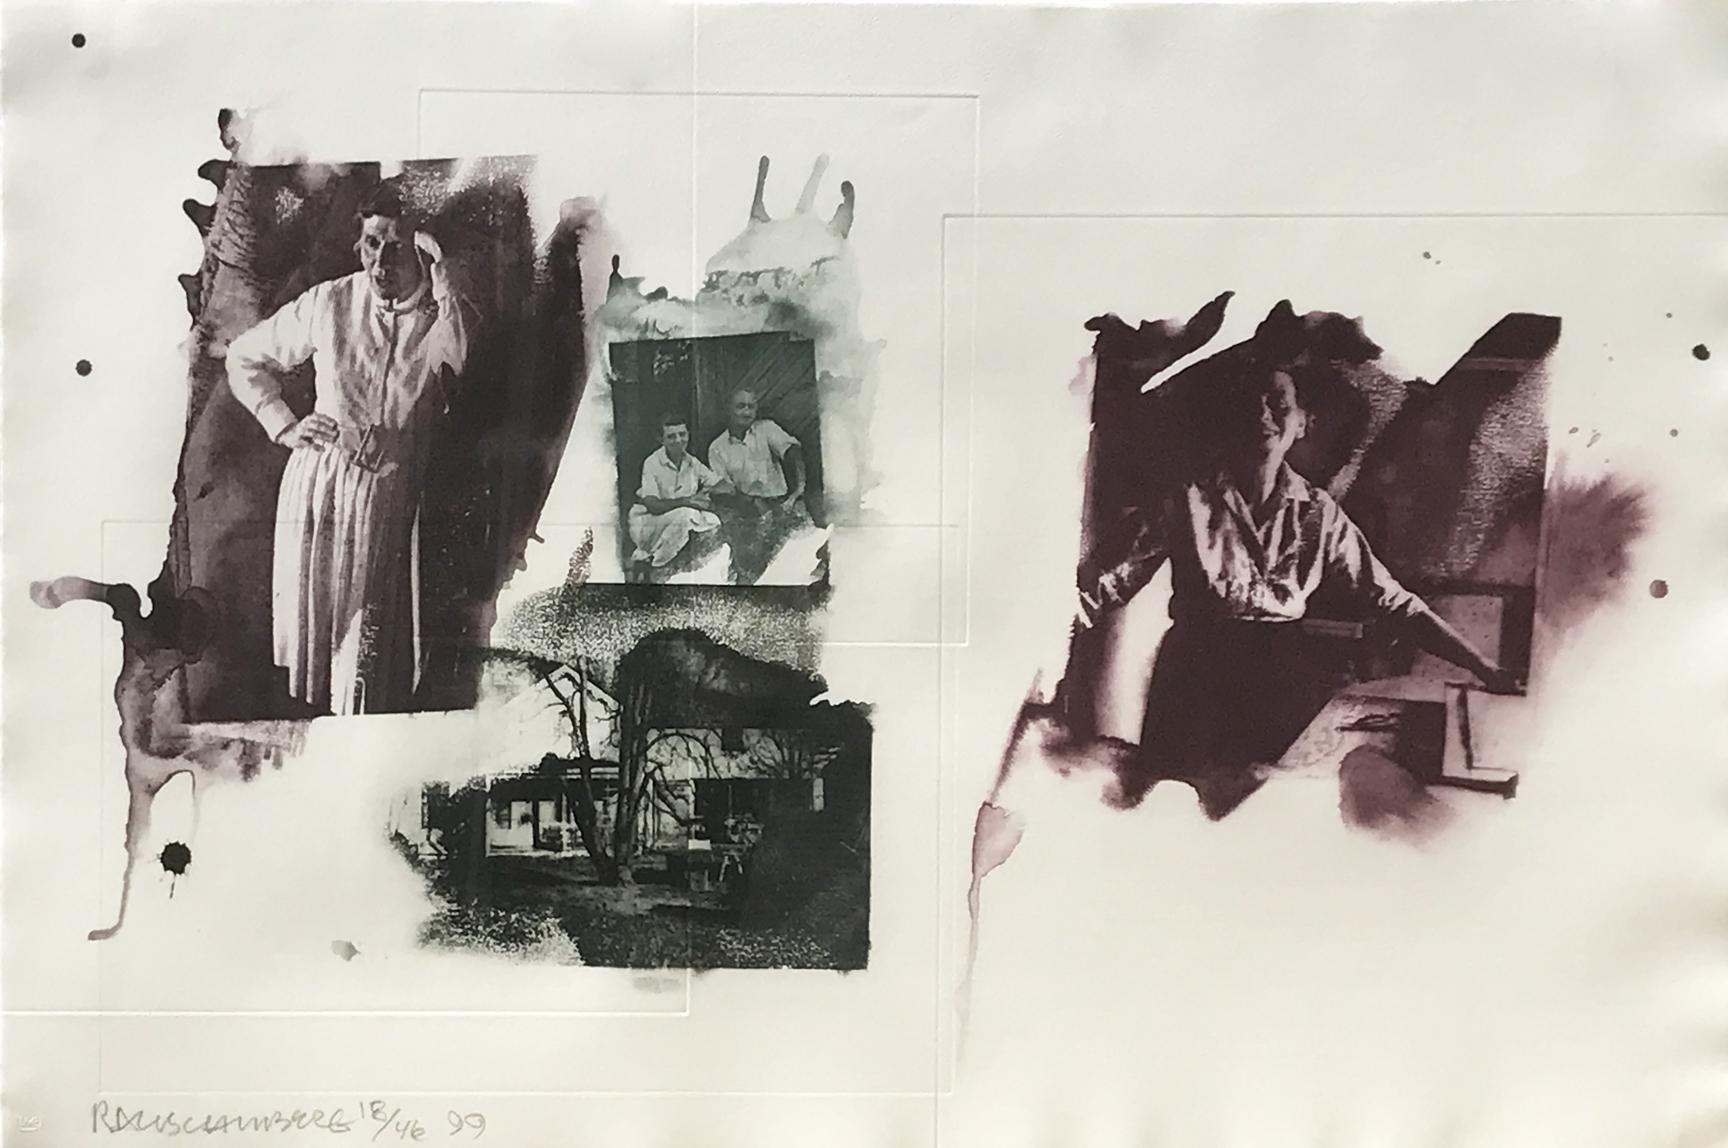 Tanya (Ruminations), 2000. 200.E029.